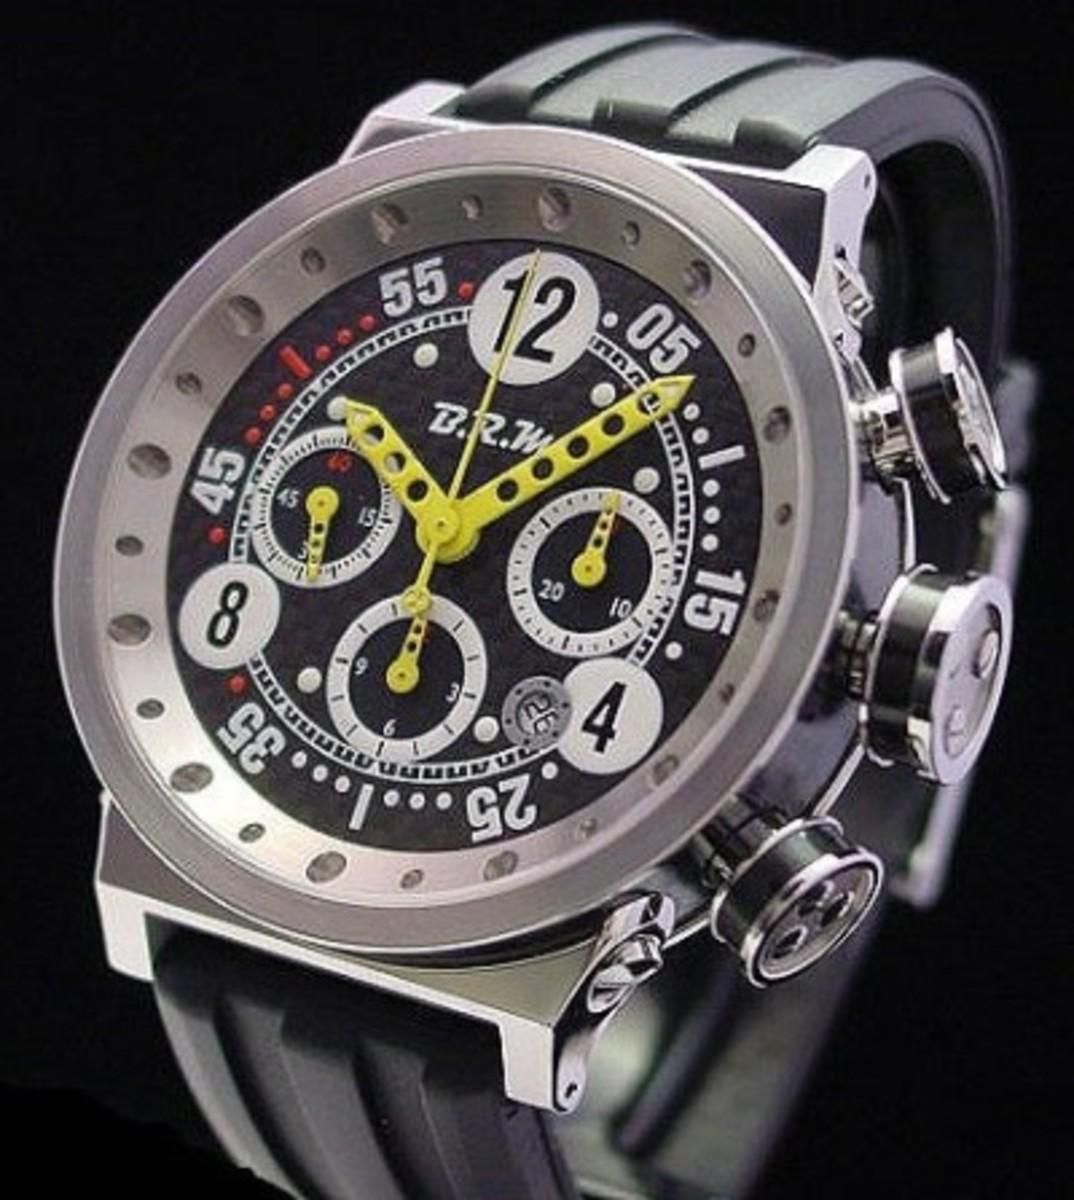 BRM watches